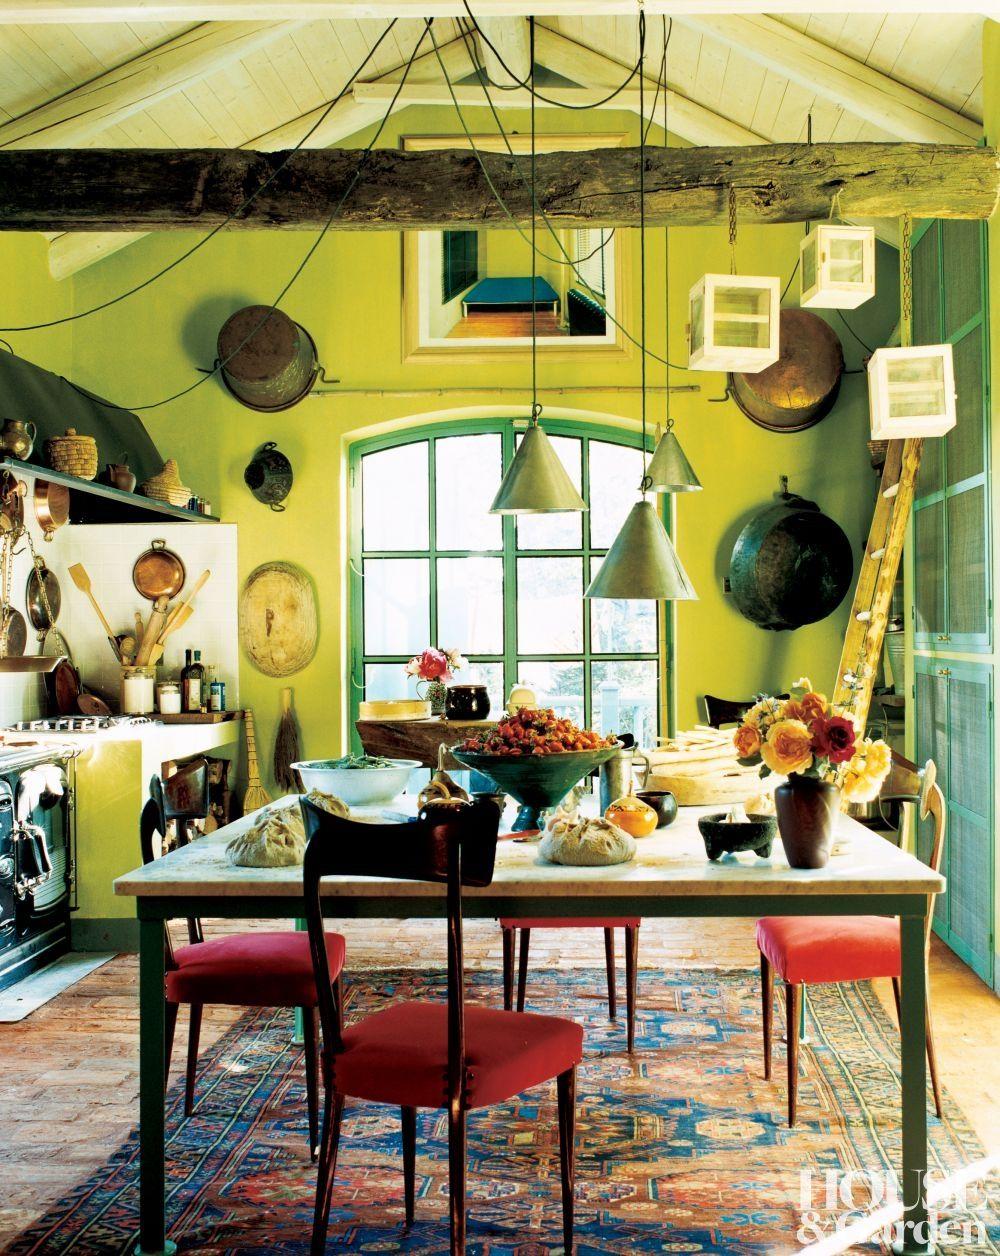 Rustic Kitchen in Piedmont, Italy | interior motives | Pinterest ...